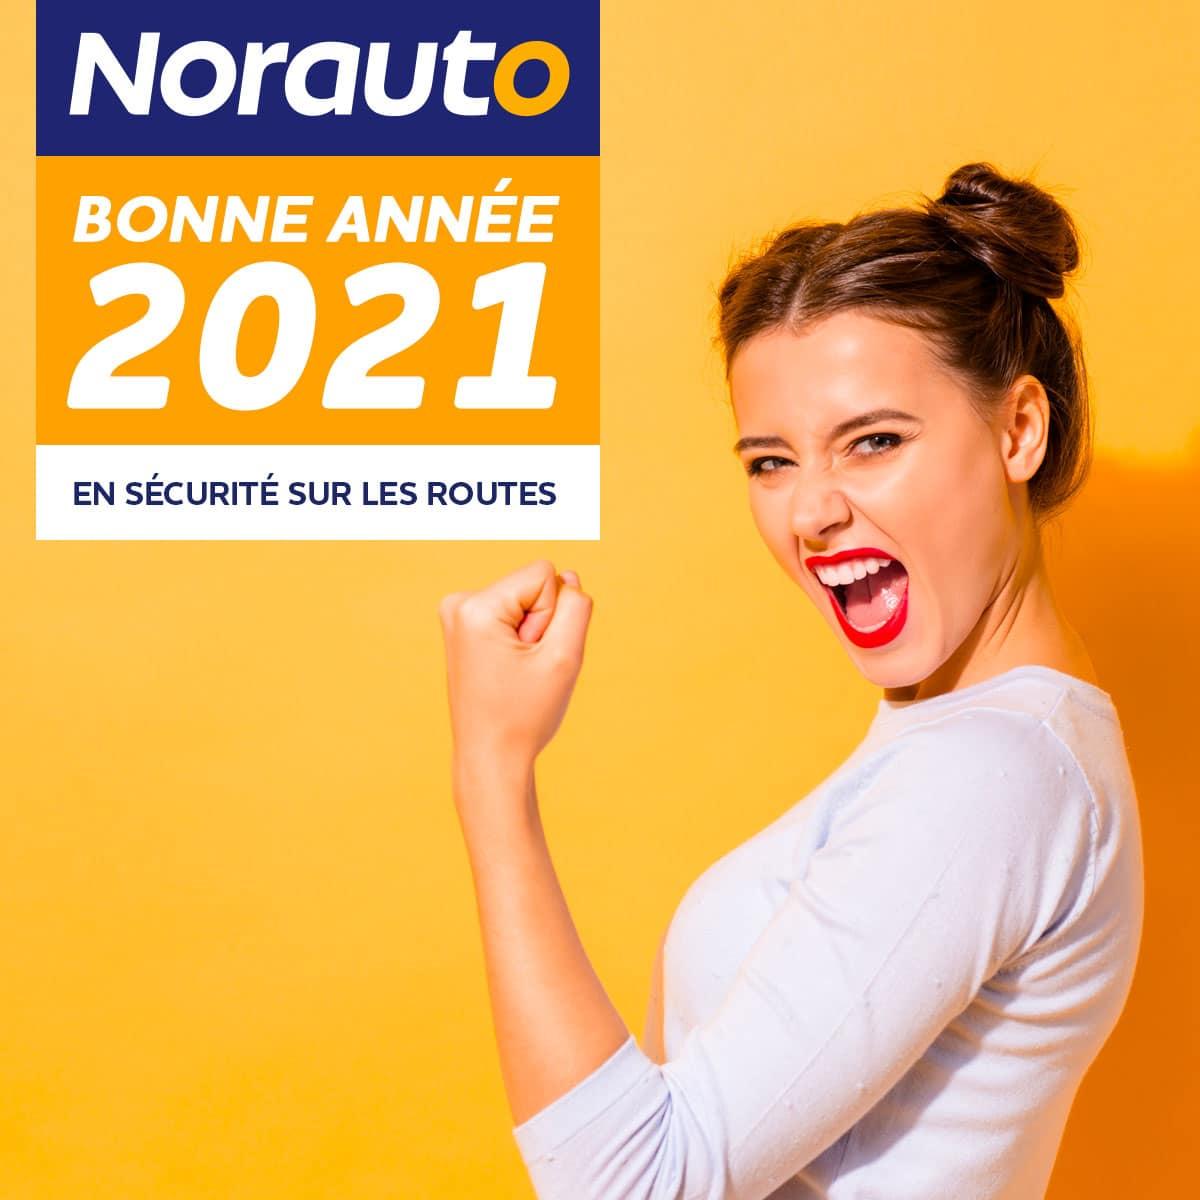 NORAUTO-1200x1200px-Janvier2021-POST2-2